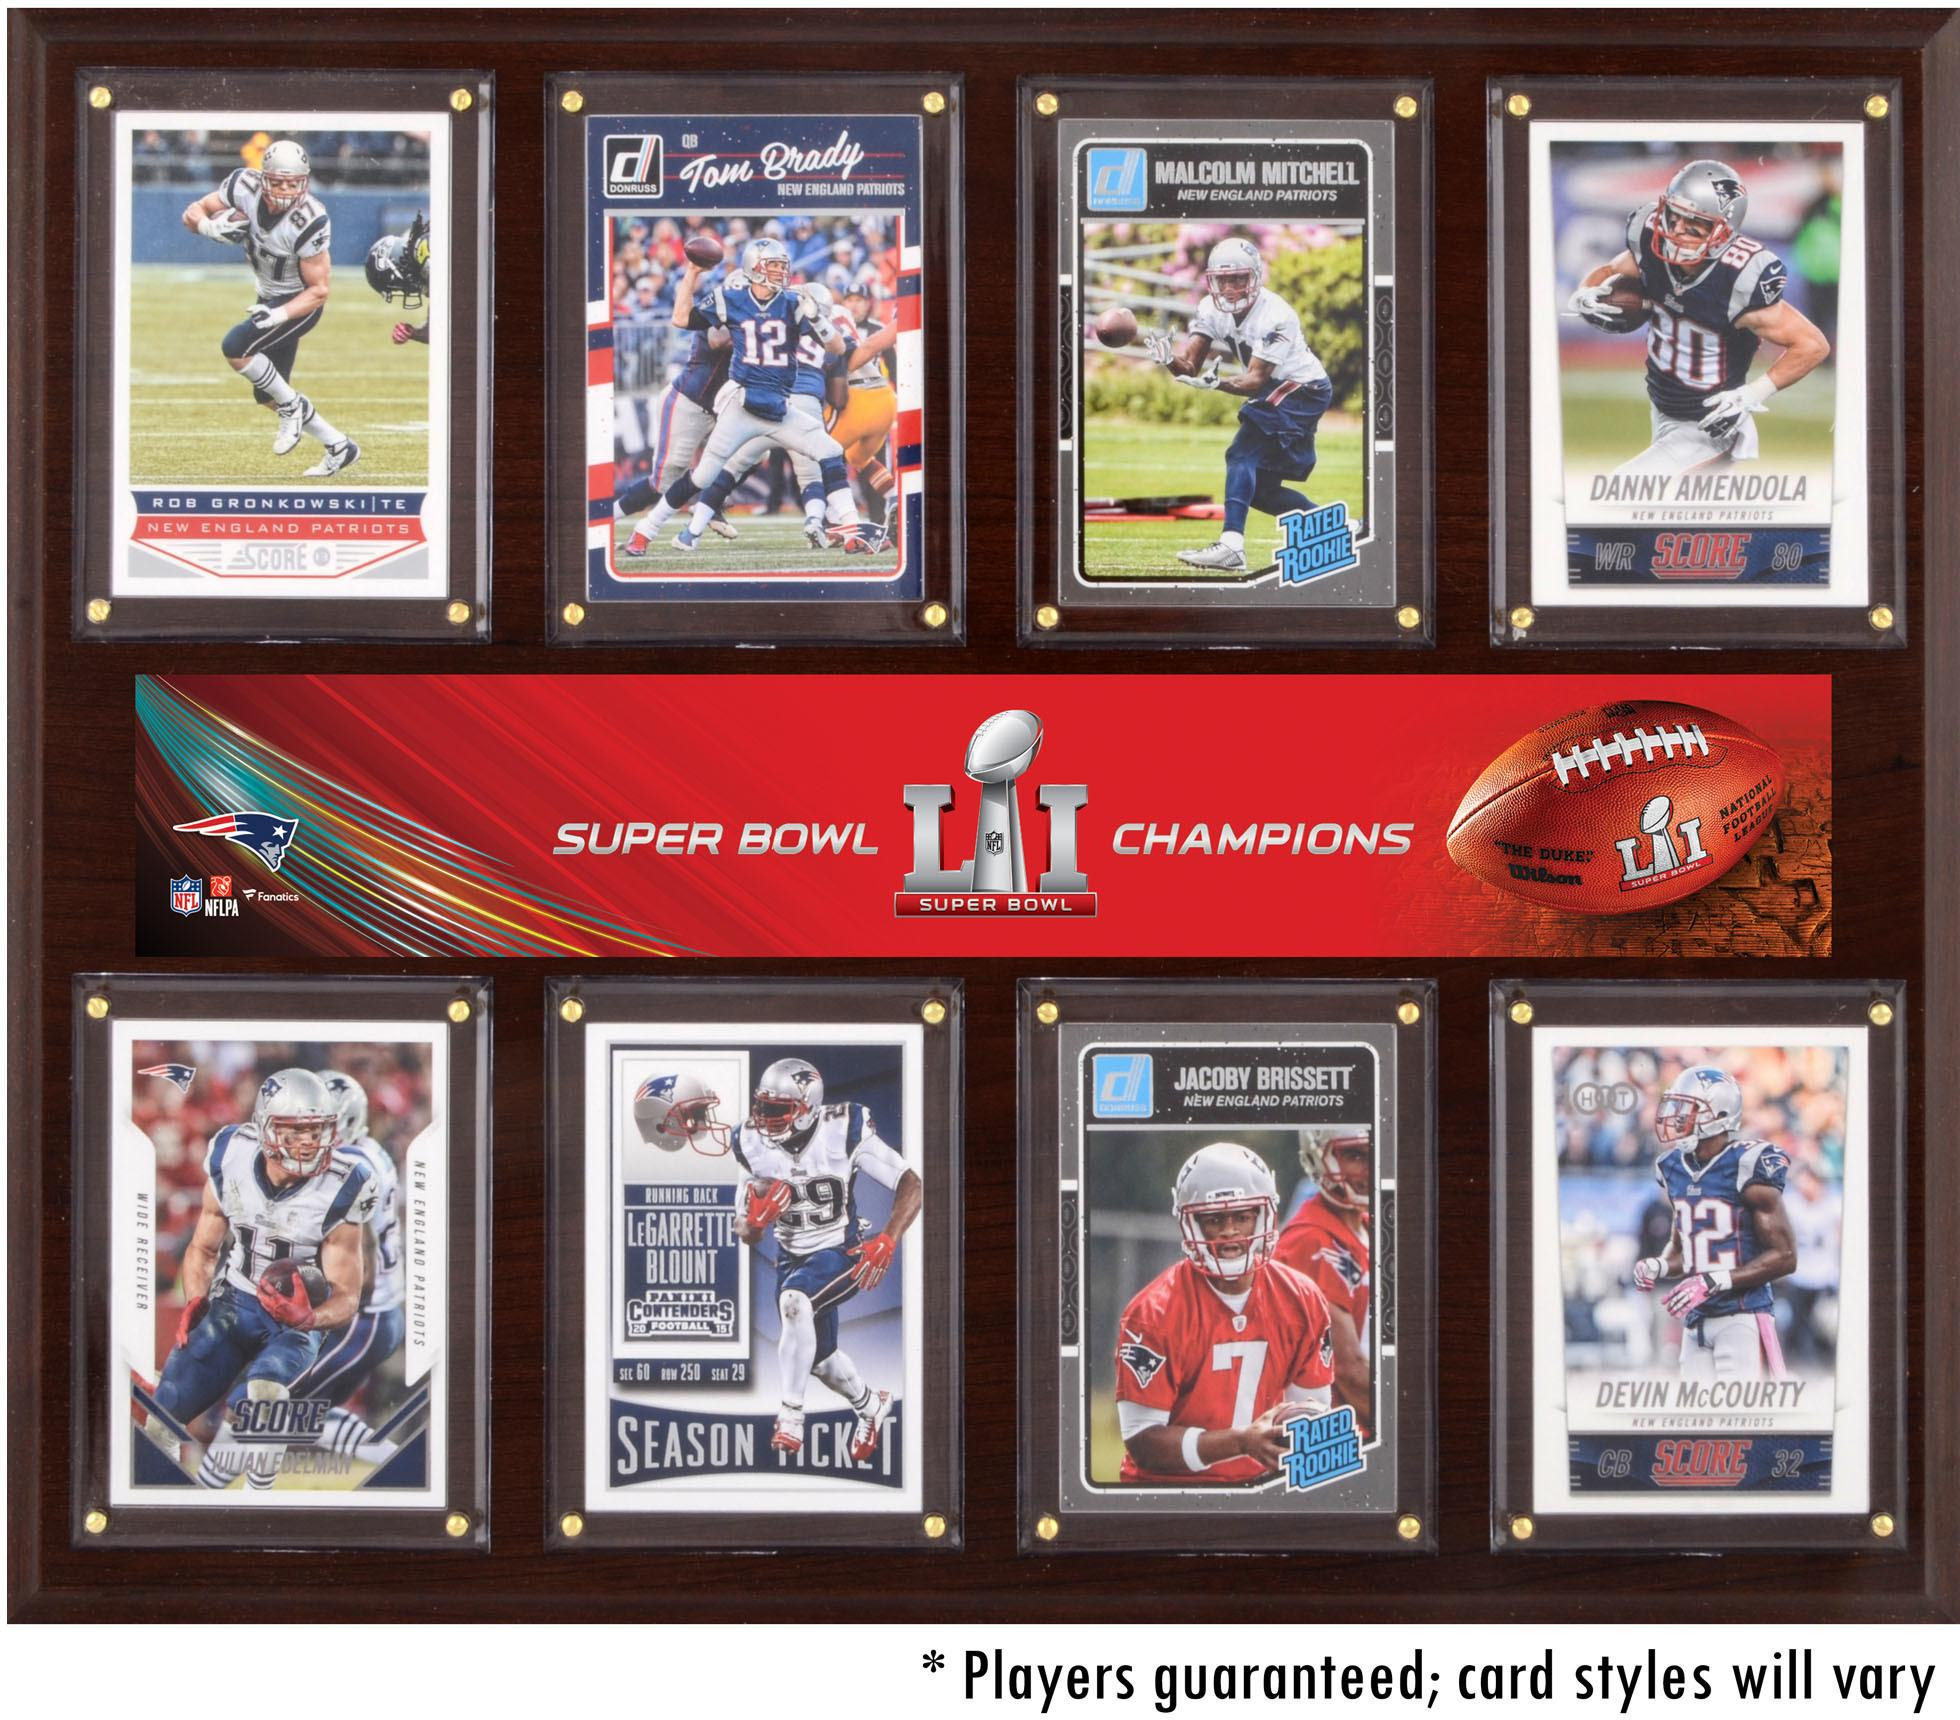 Sports Memorabilia - New Engla...